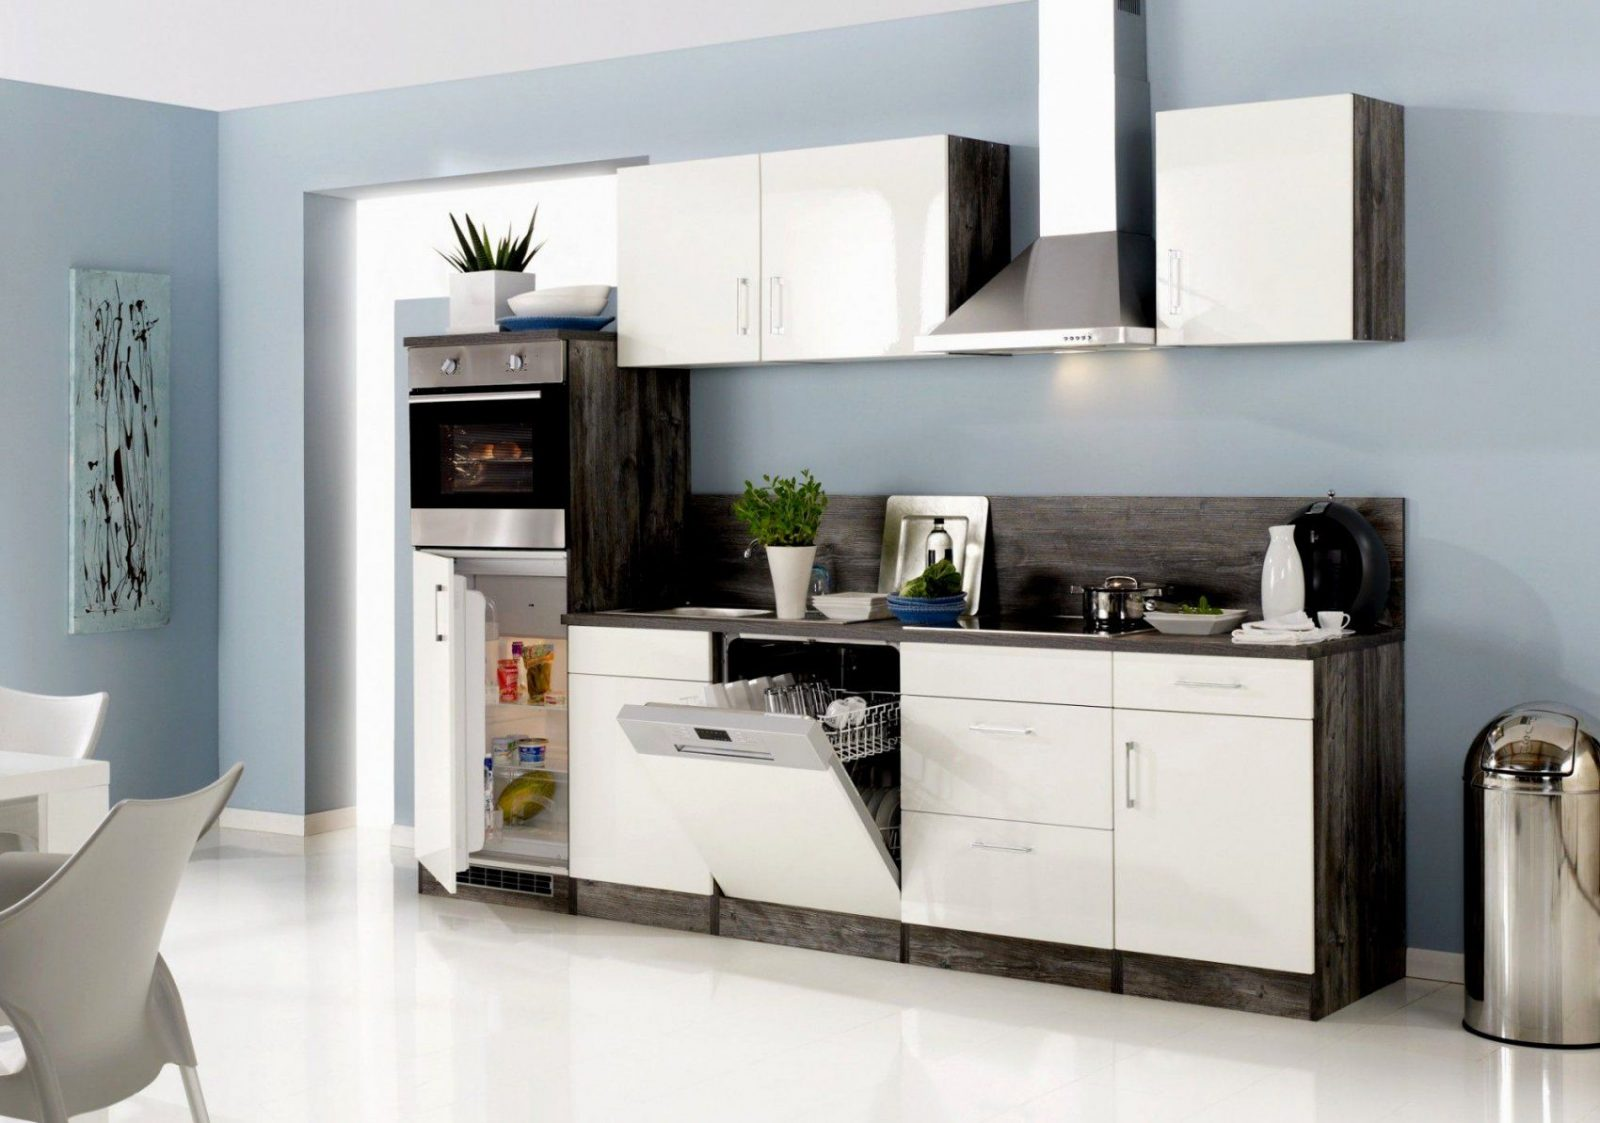 k chenblock mit e ger ten g nstig haus design ideen. Black Bedroom Furniture Sets. Home Design Ideas